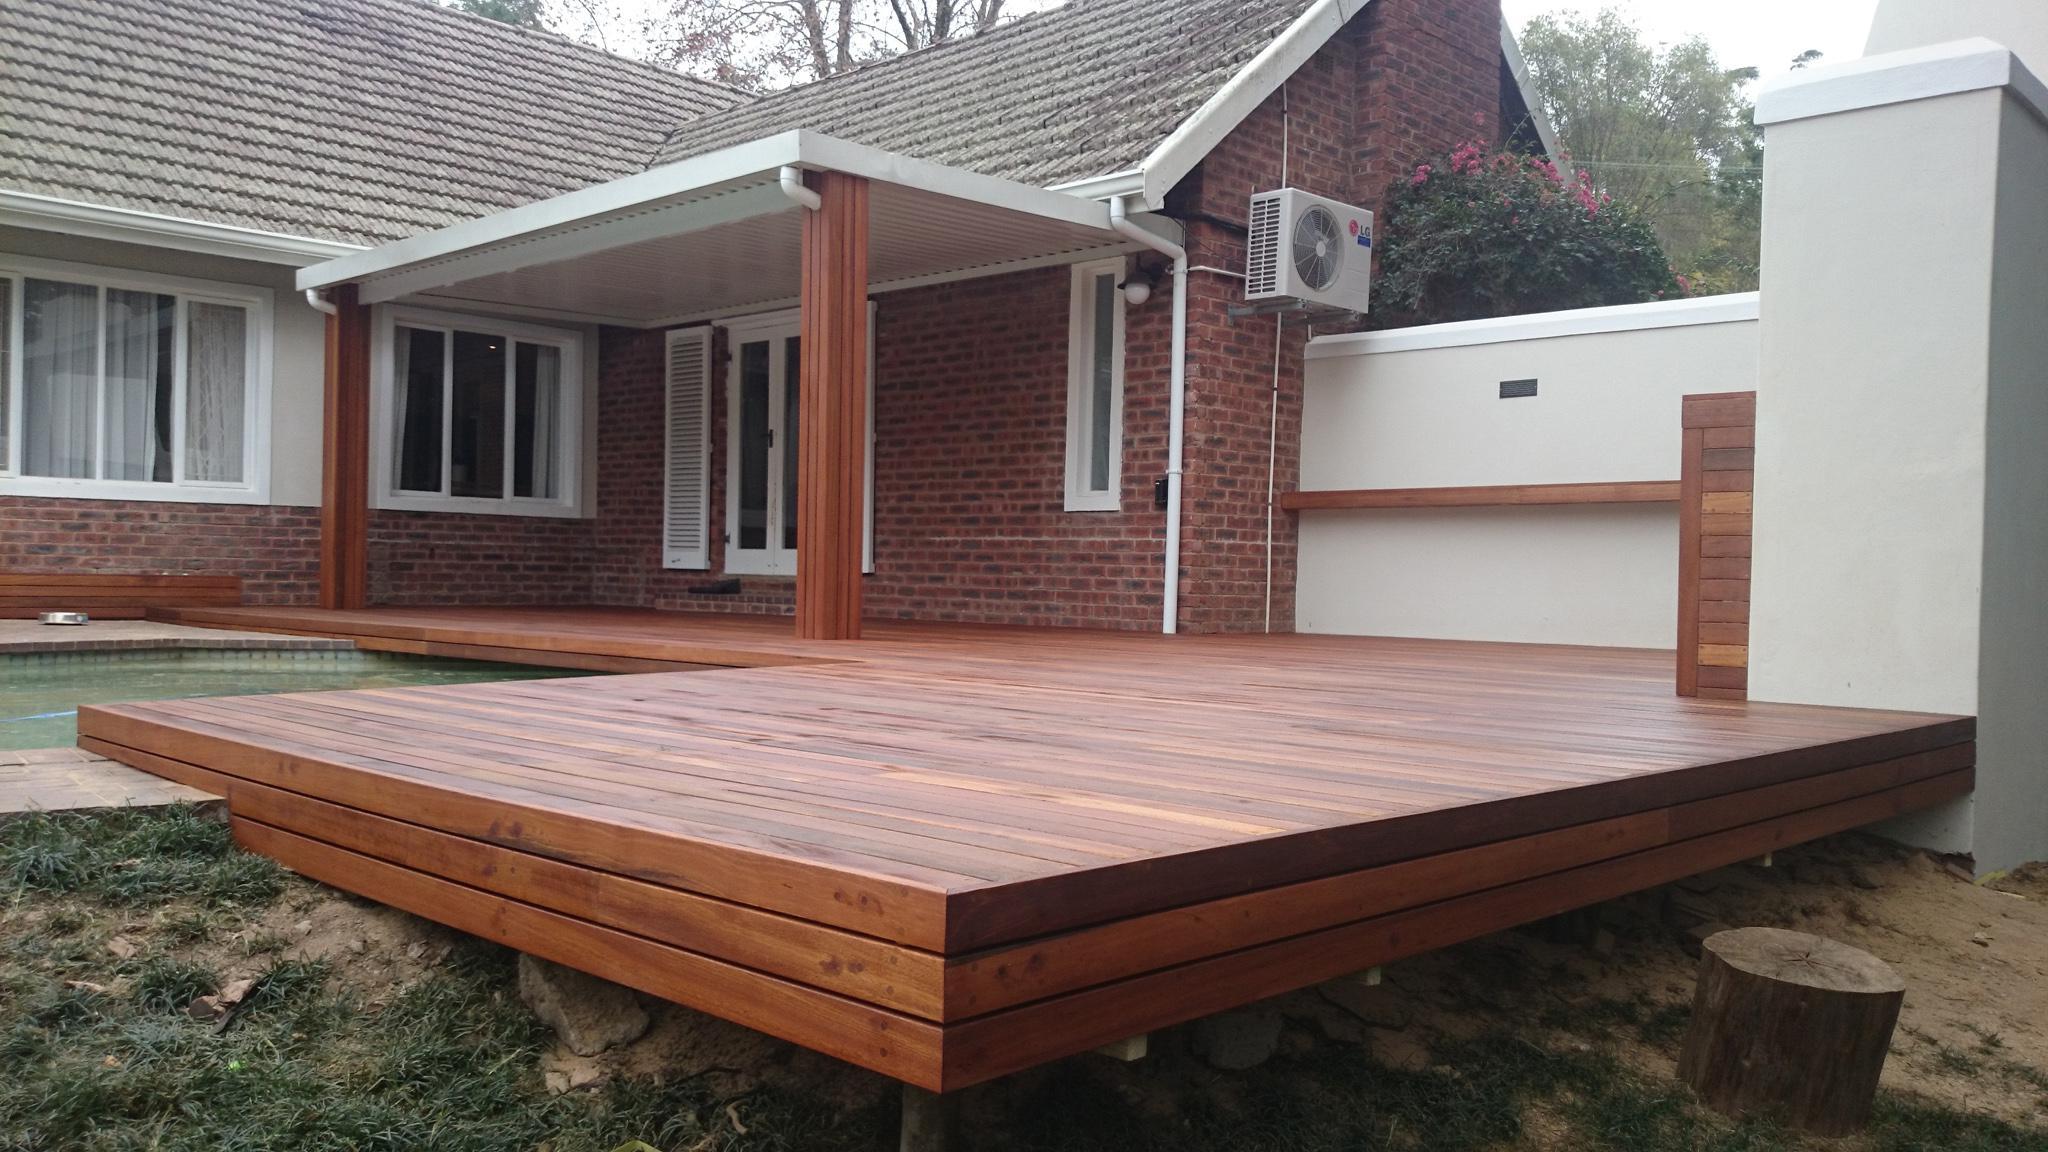 Contemporary Design Wooden Patio Deck Ideas Chocoaddicts Tierra inside sizing 2048 X 1152